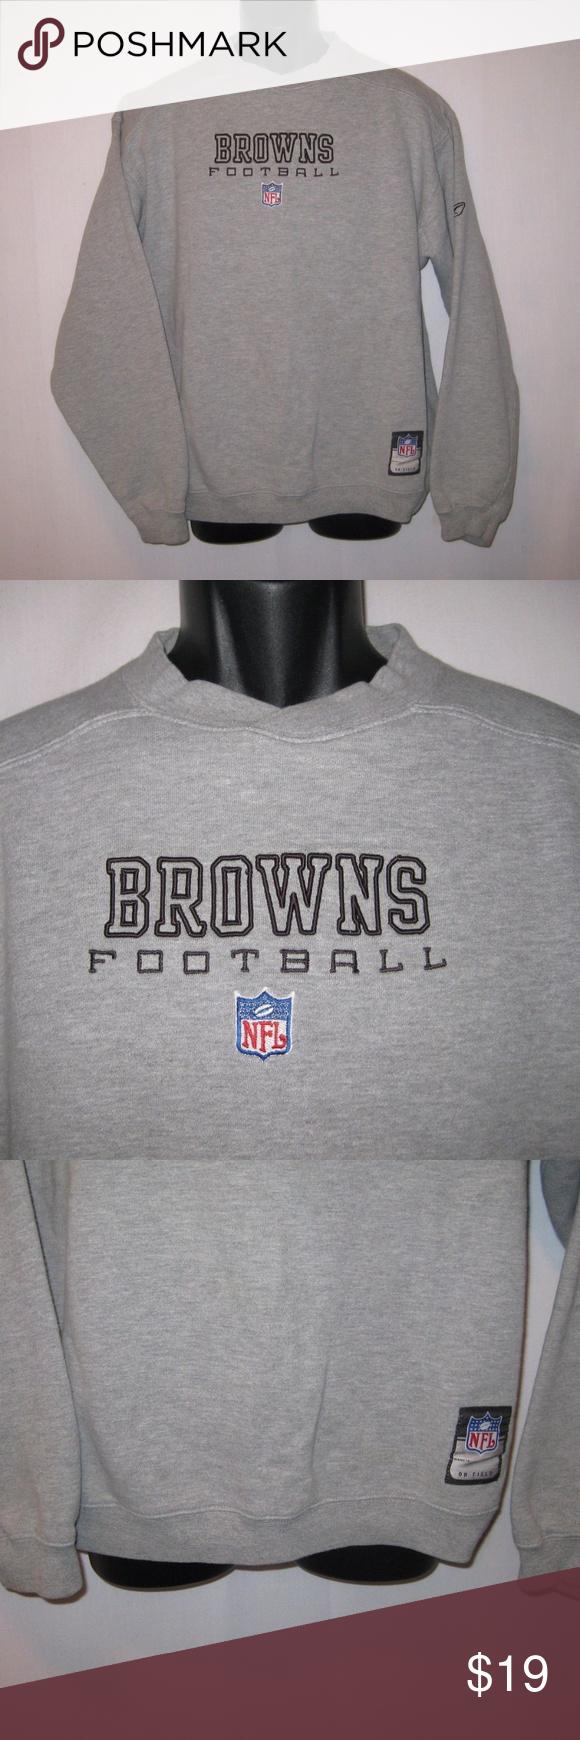 Reebok Cleveland Browns Sweatshirt Nfl Team Sz M Cleveland Browns Sweatshirt Sweatshirts Reebok [ 1740 x 580 Pixel ]